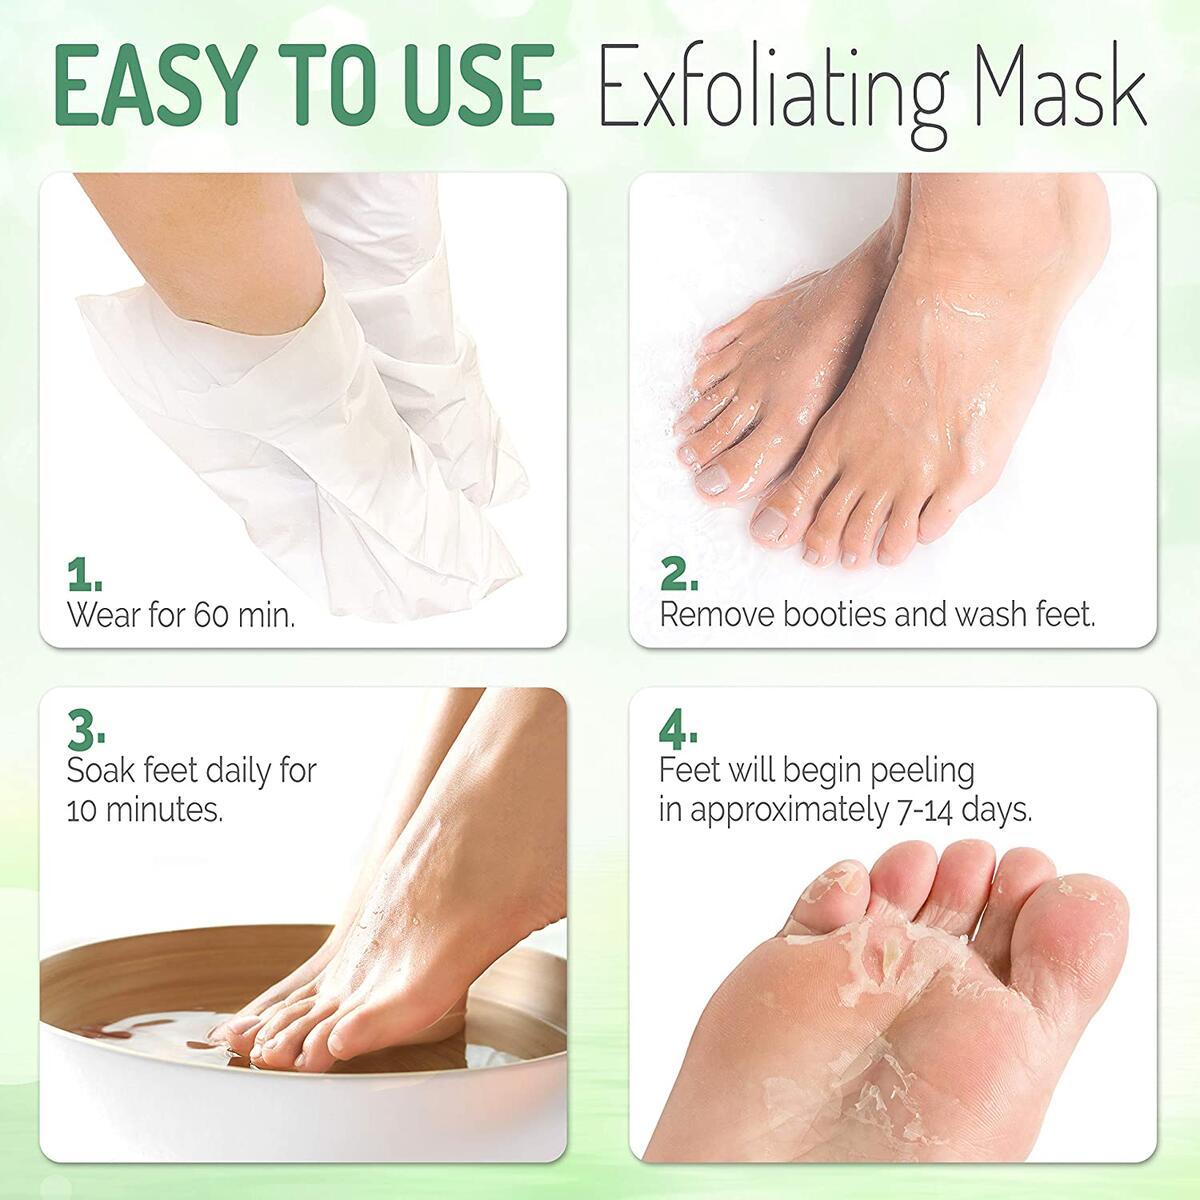 Tea Tree Foot Peel Mask – 2 Pack of Peeling Booties – Natural Foot Care Exfoliating Treatment Repairs Cracked Heels, Calluses & Removes Dead, Dry Skin